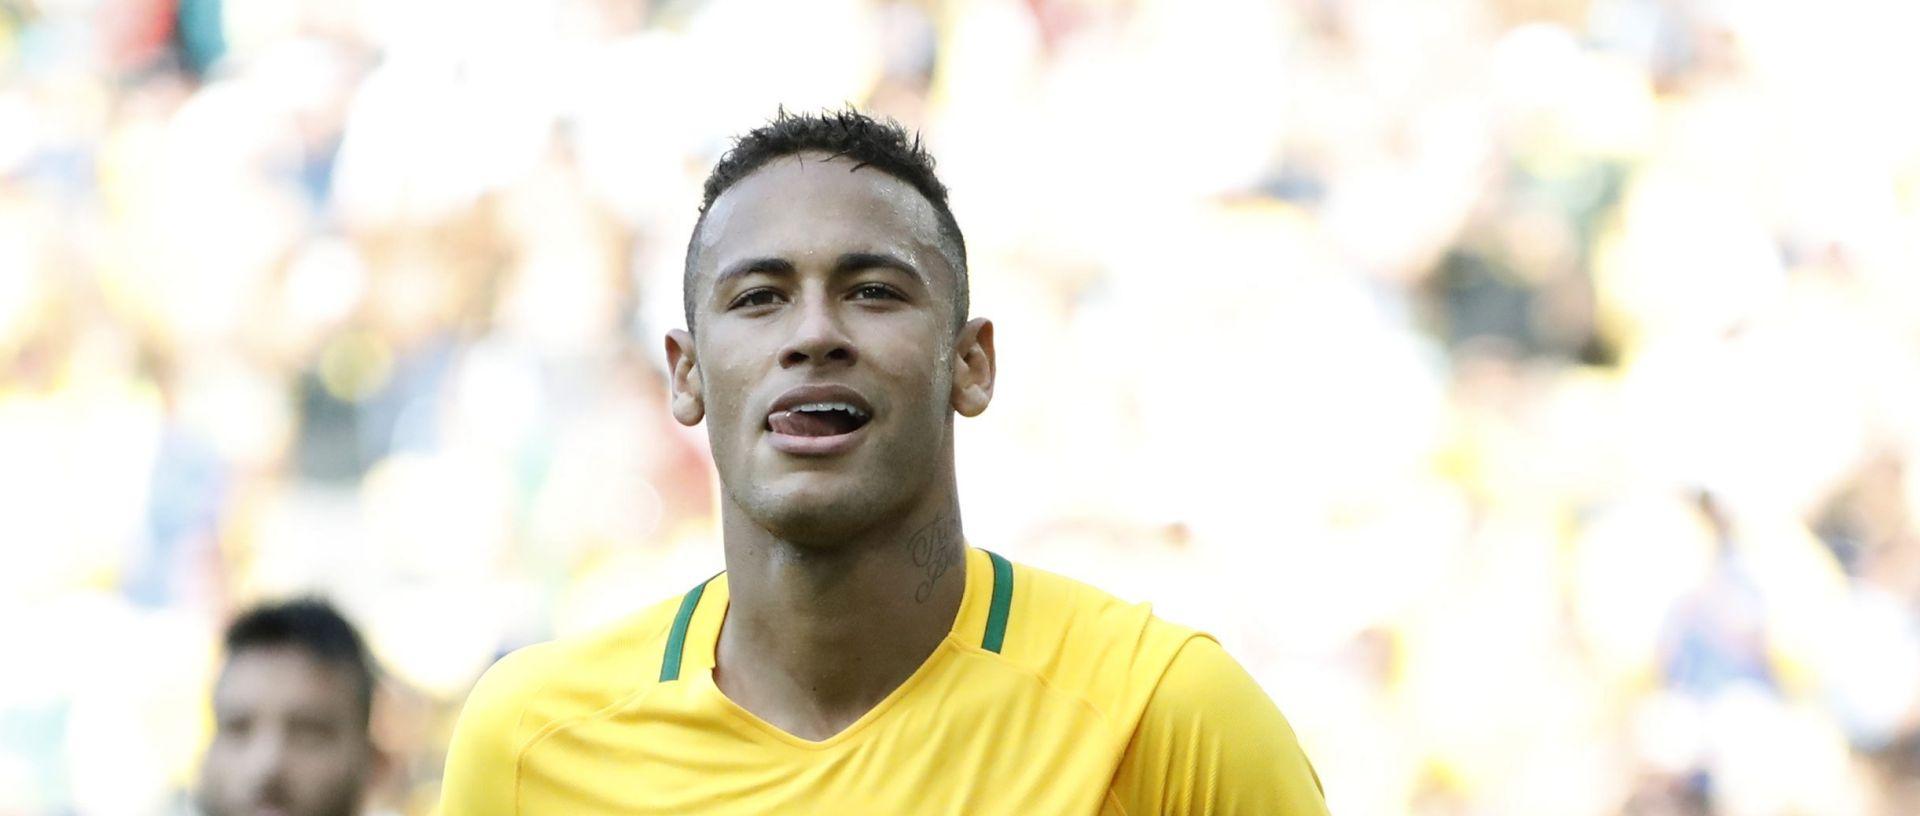 PLASMAN U FINALE: Šestica Brazila, rekord Neymara